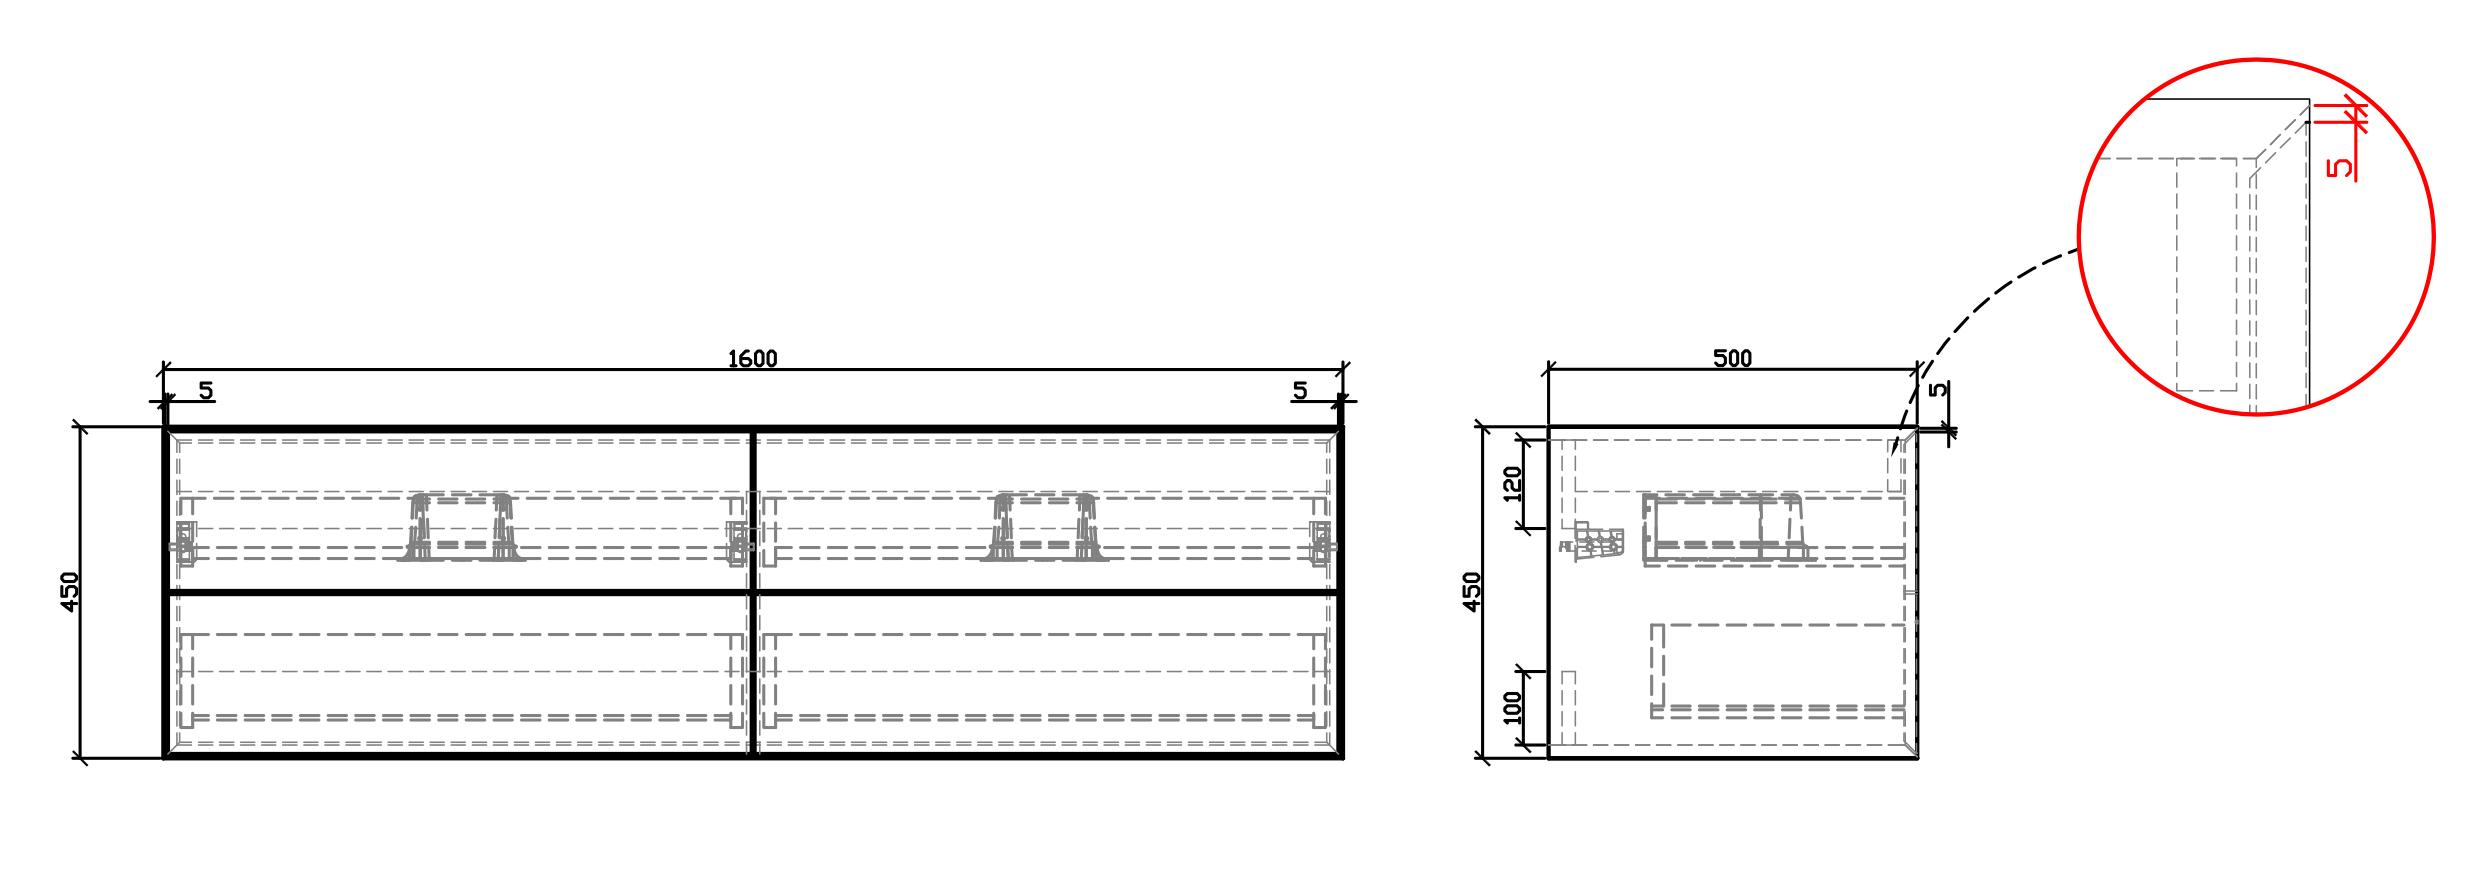 Bathroom furniture set Milou 1600 - Drawing 1